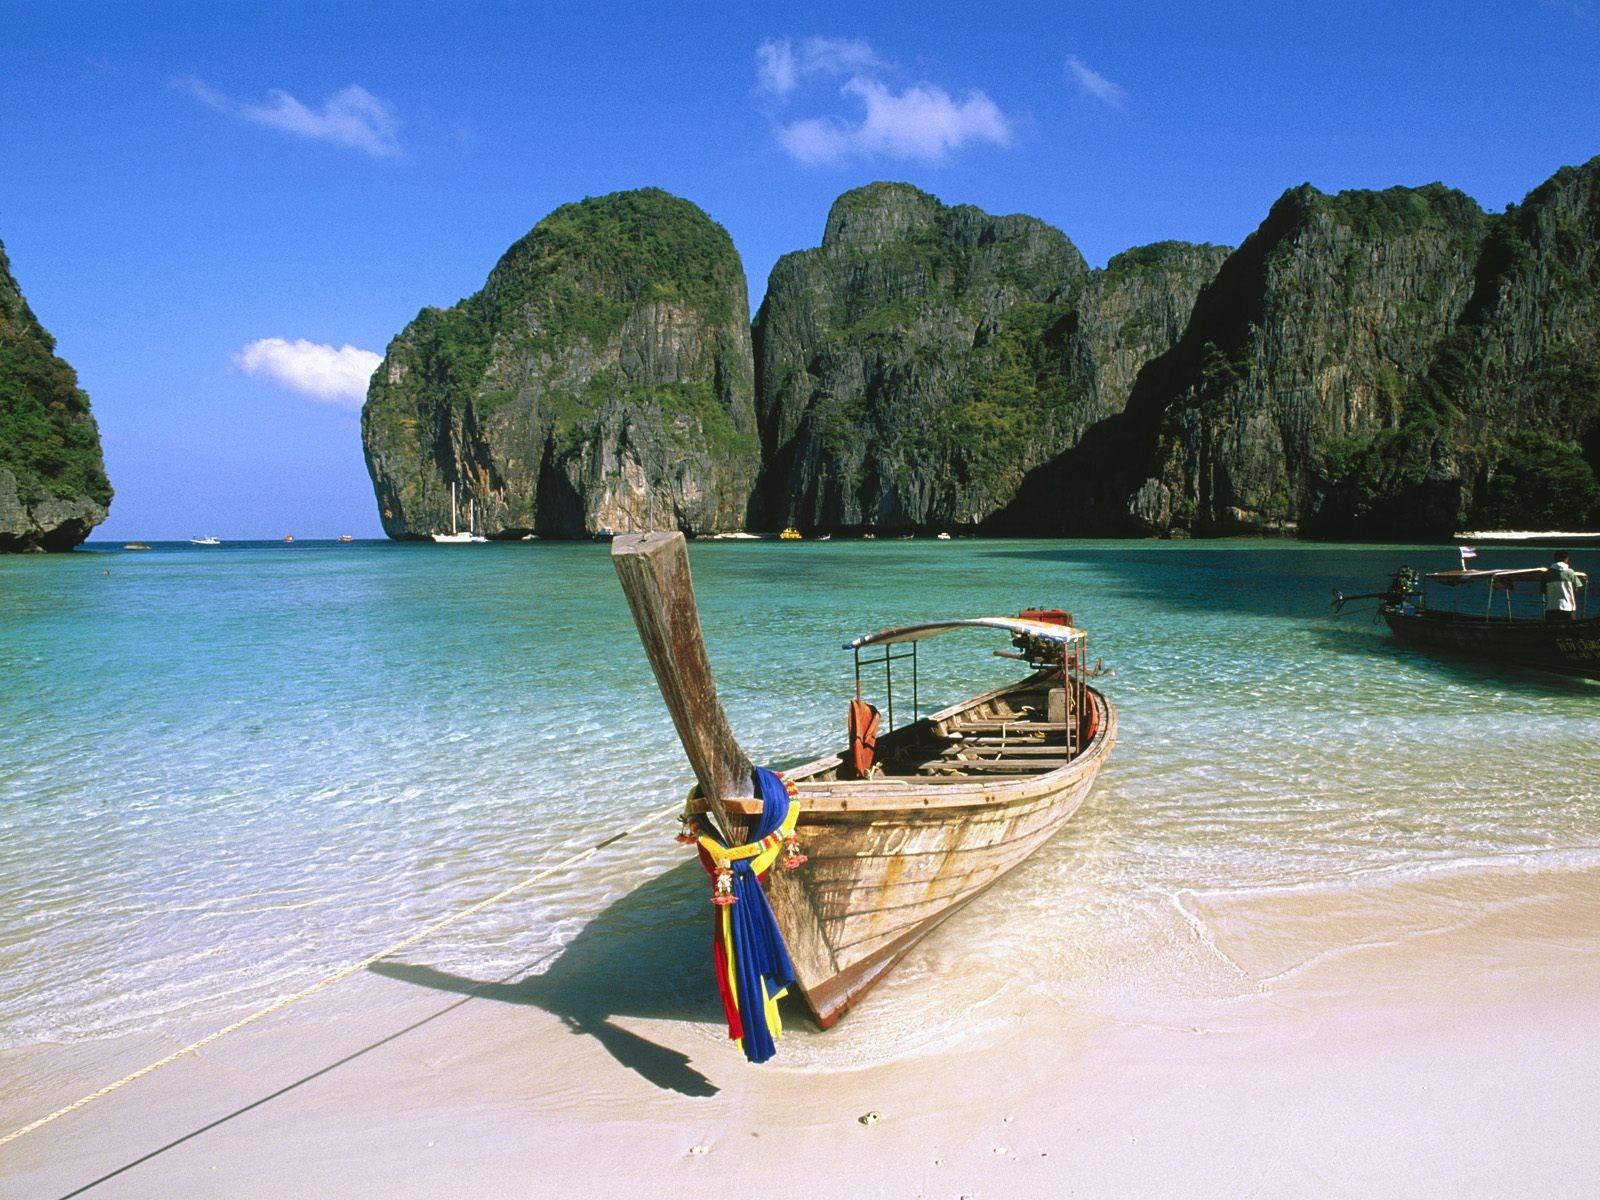 wyprawa_tajlandia-1.jpg